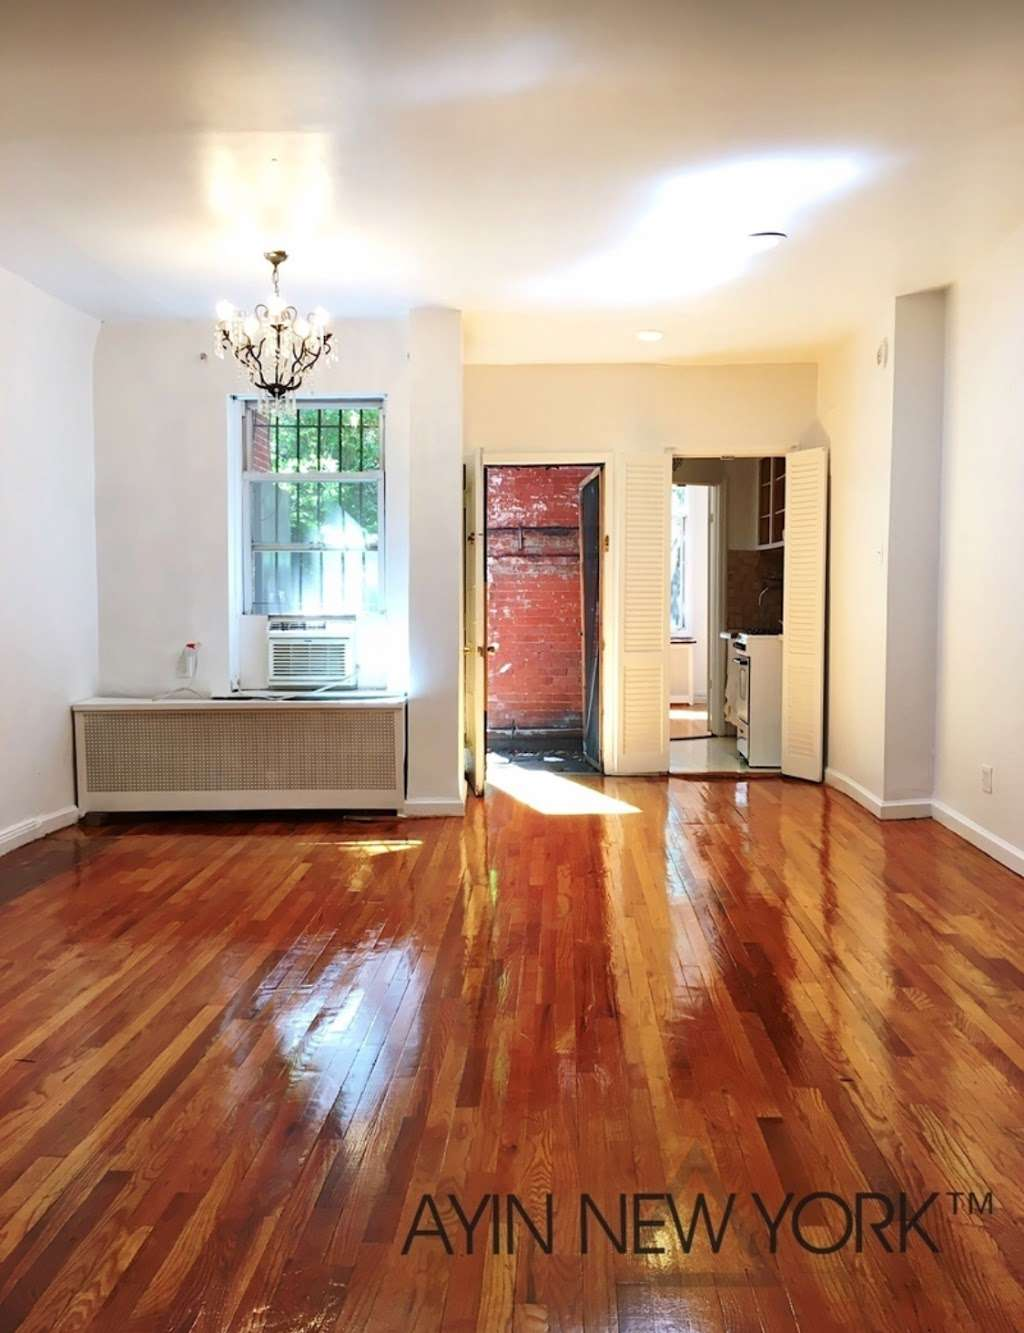 PRIME PROPERTY NYC™ - real estate agency  | Photo 2 of 10 | Address: 1483 Gates Ave, Brooklyn, NY 11237, USA | Phone: (917) 808-7258